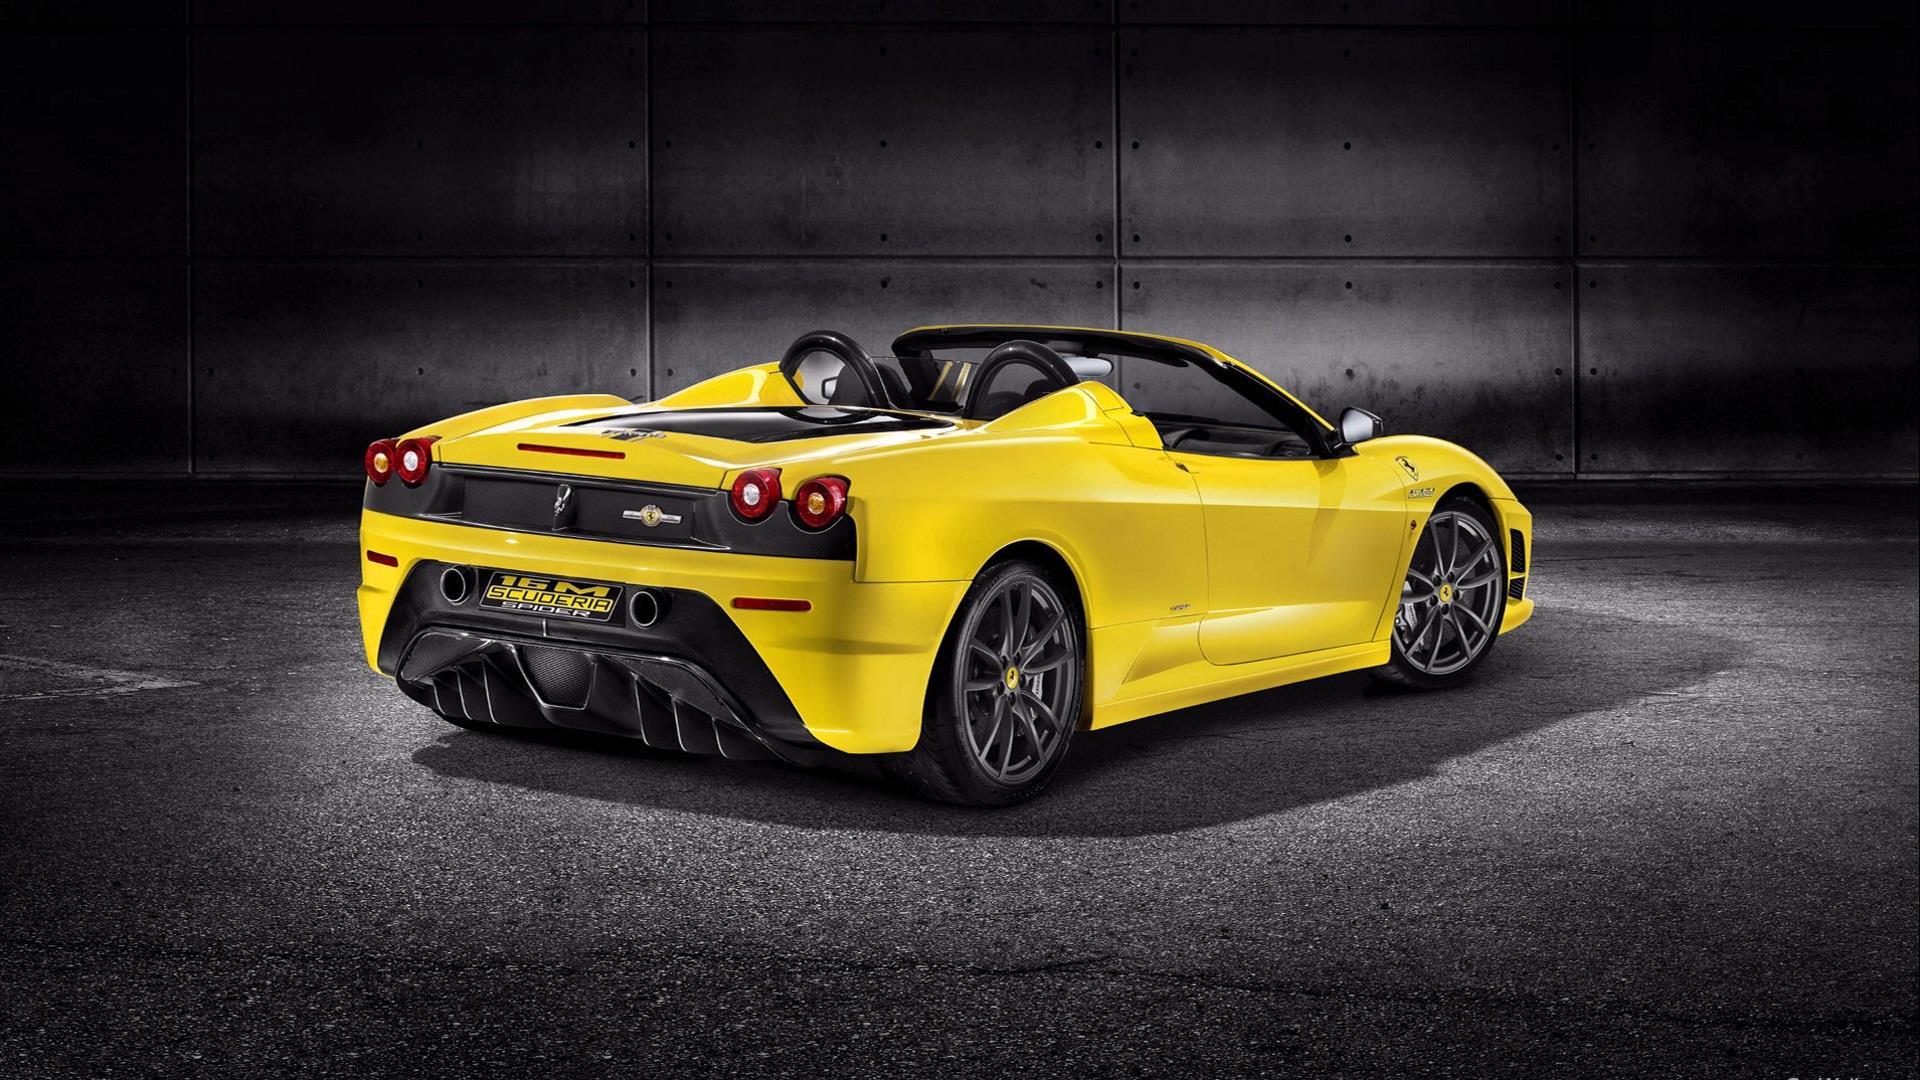 jaune-ferrari-automobile-de-luxe-passion_6